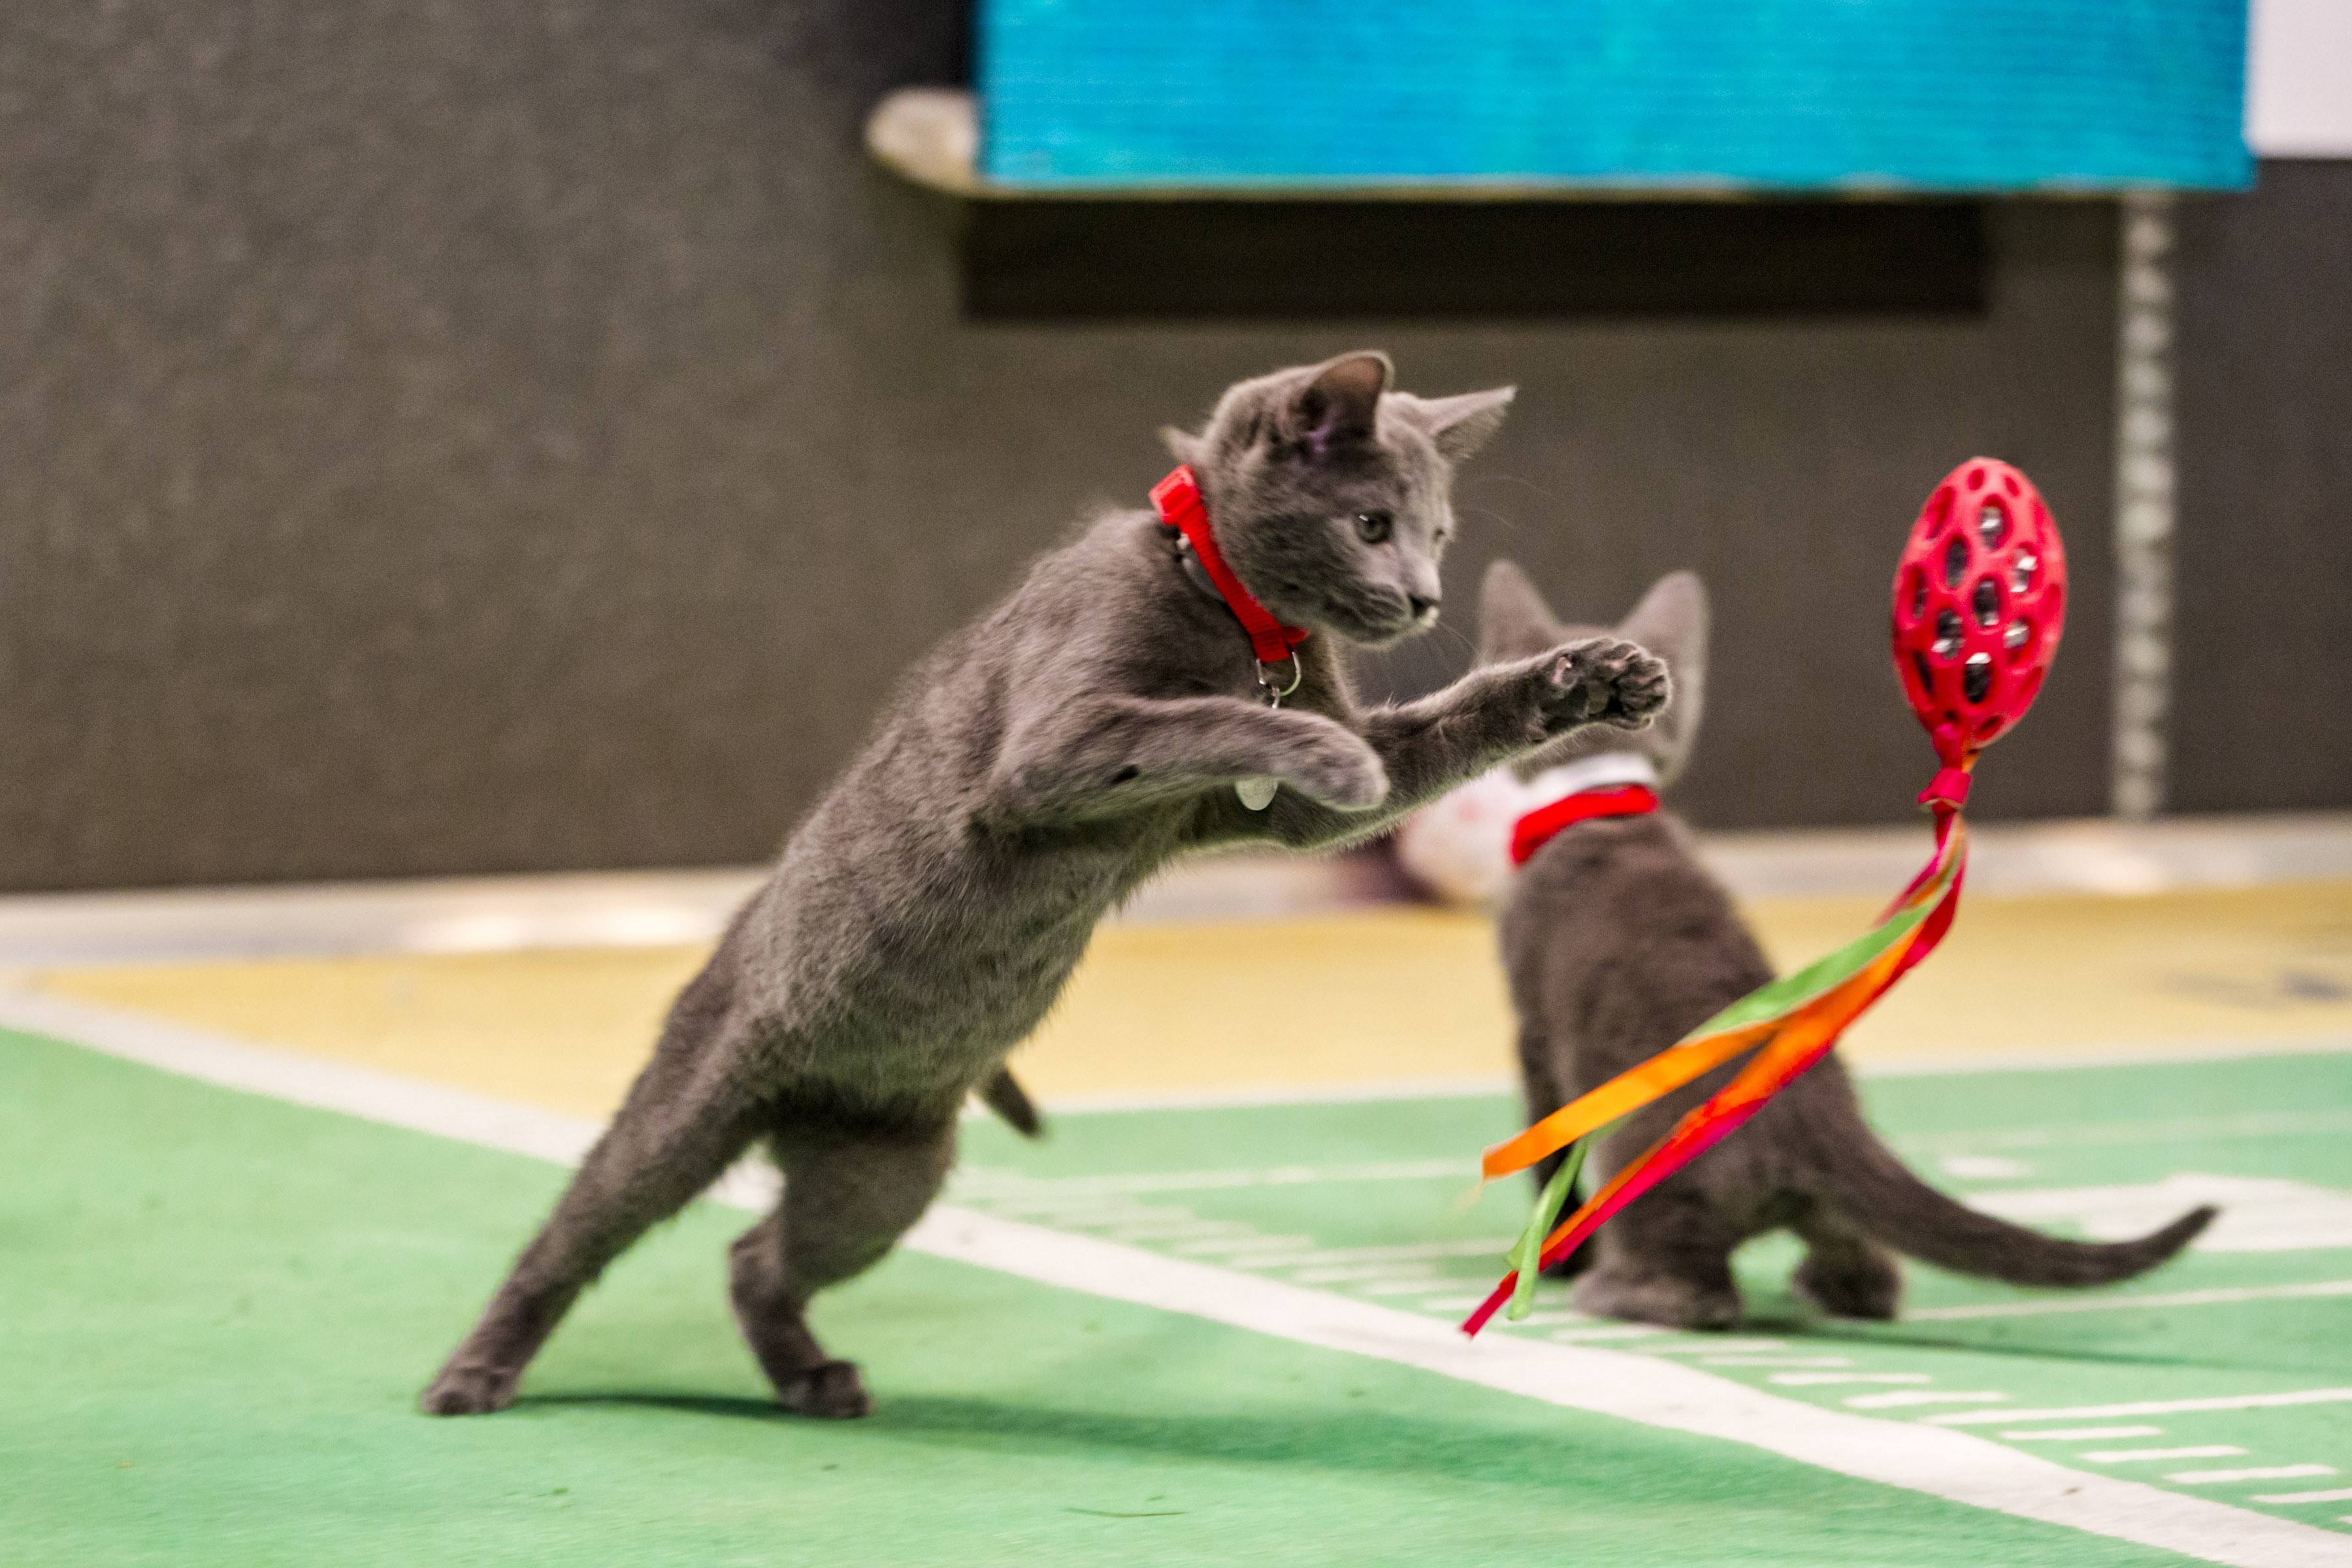 Kitten Bowl III takes on Super Bowl 50 beth stern 2016